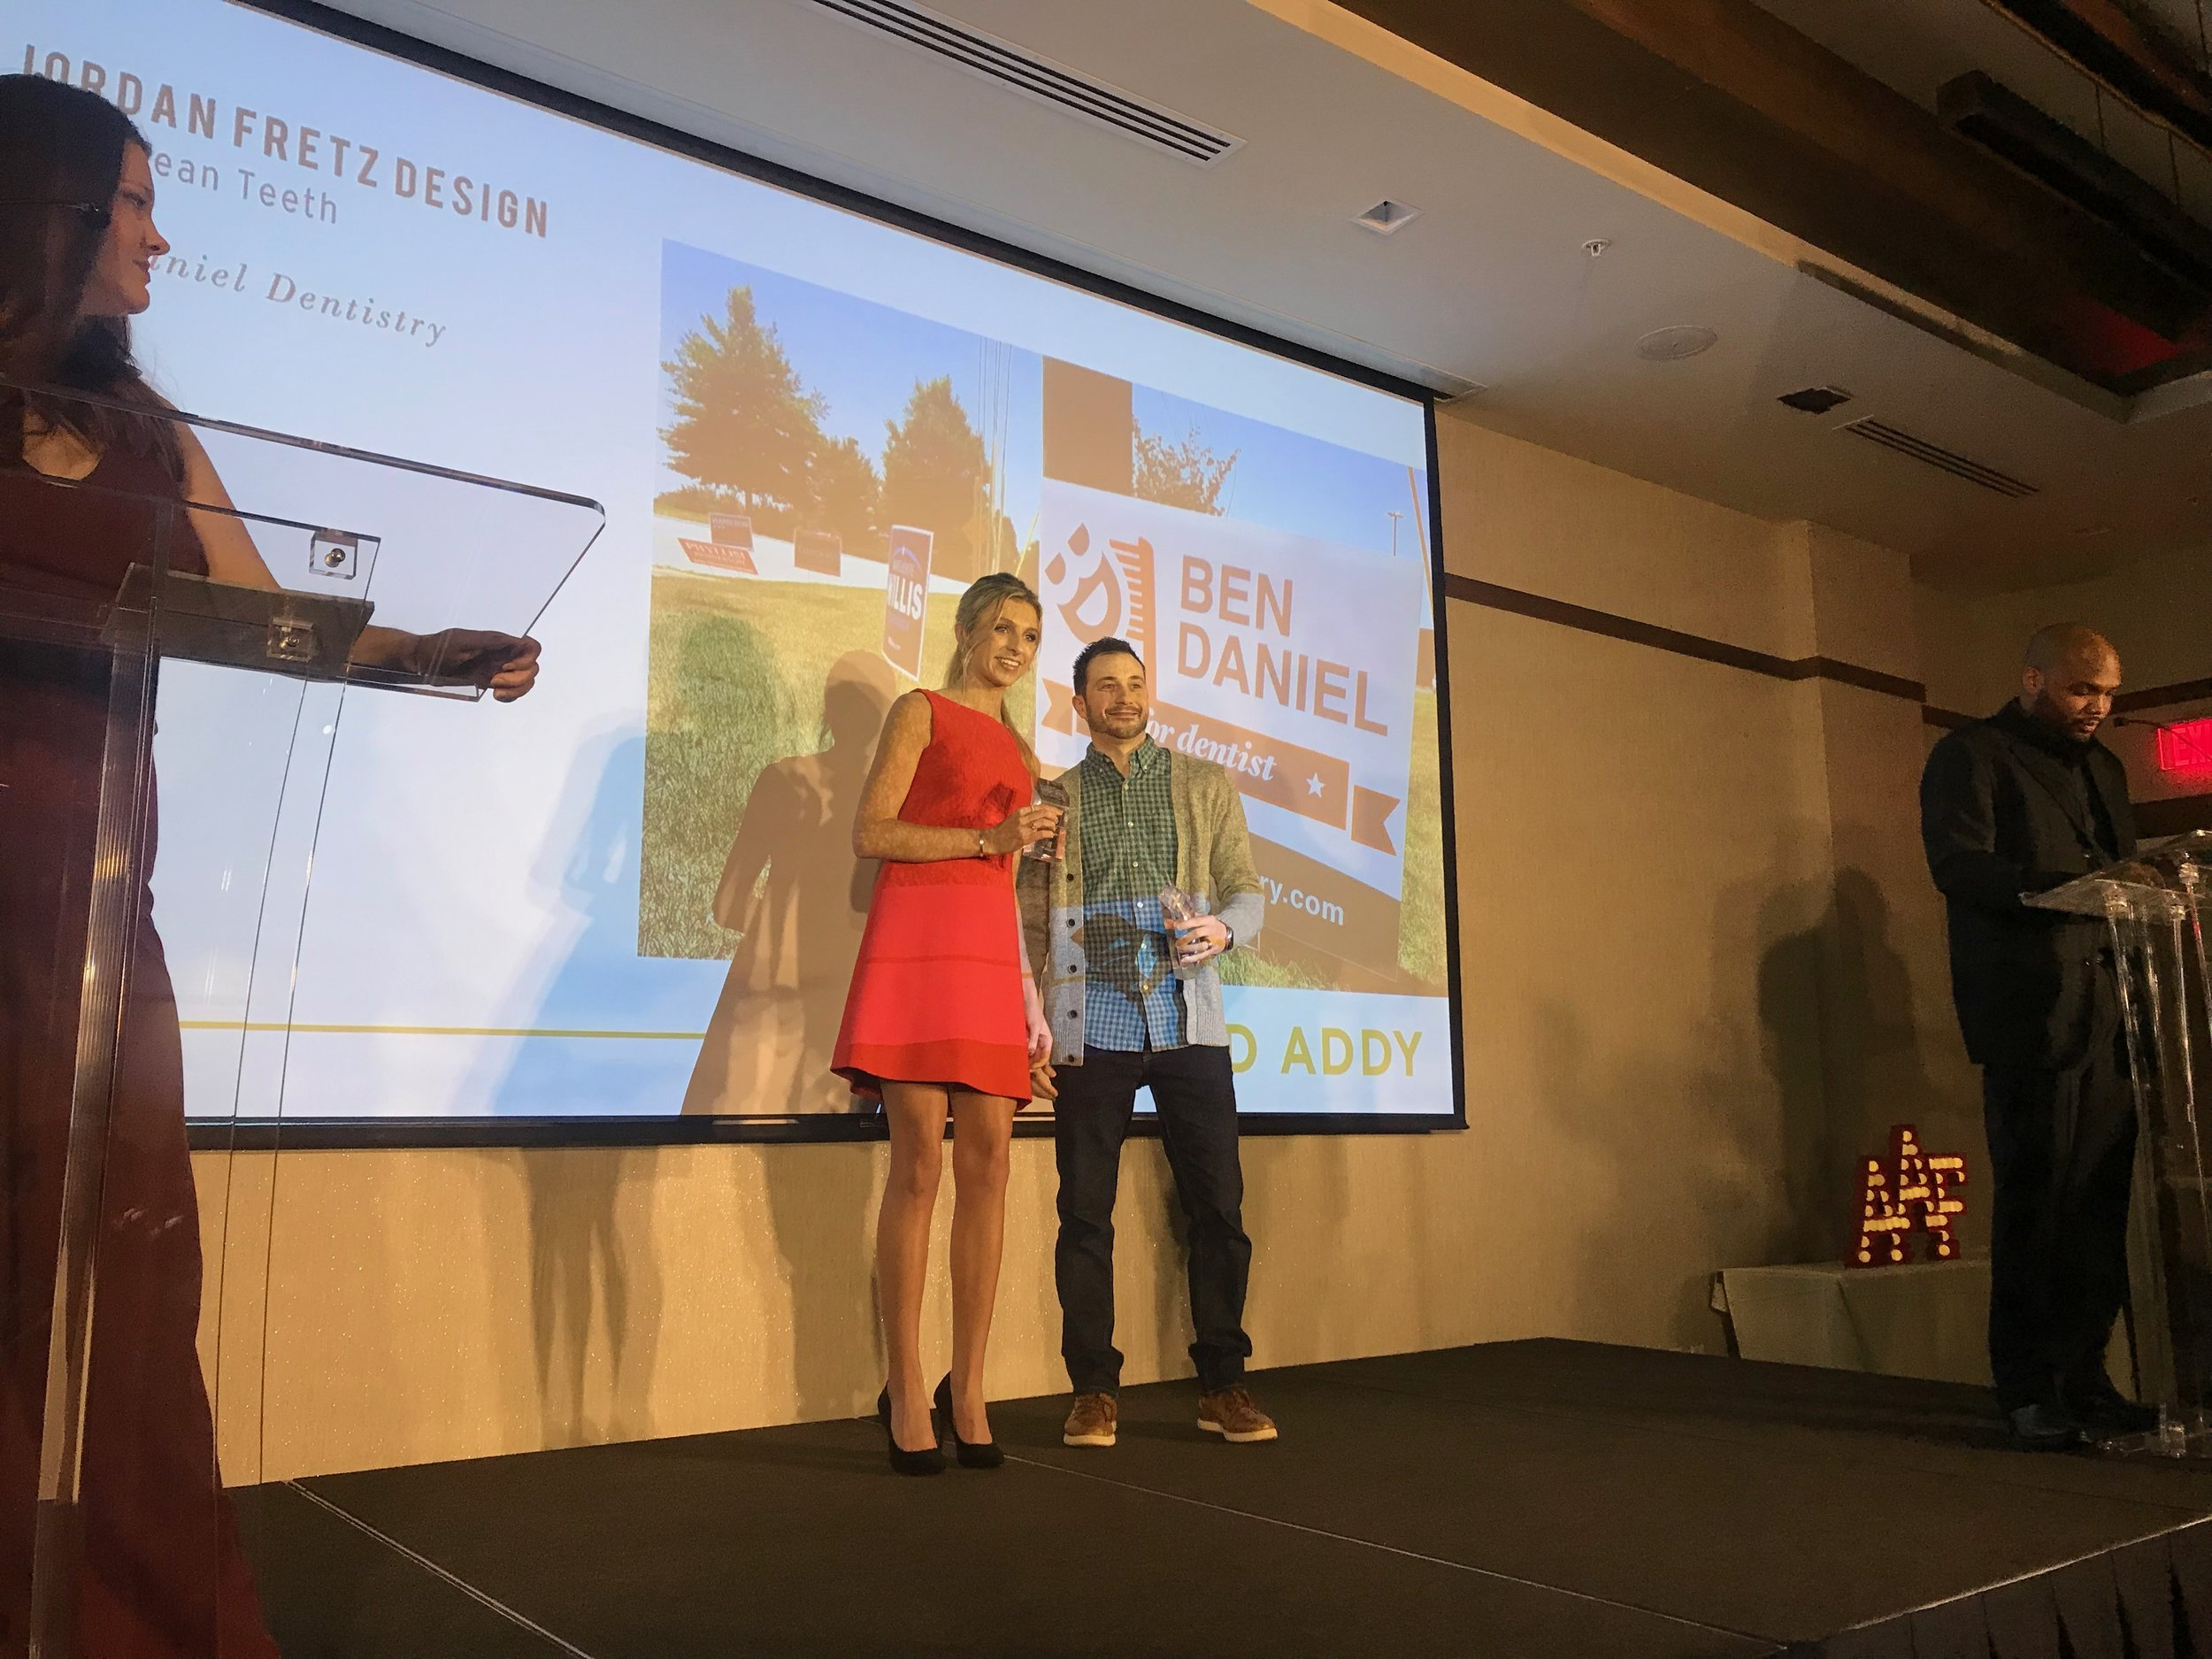 jordan-fretz-addy-awards-greenville-7.jpg